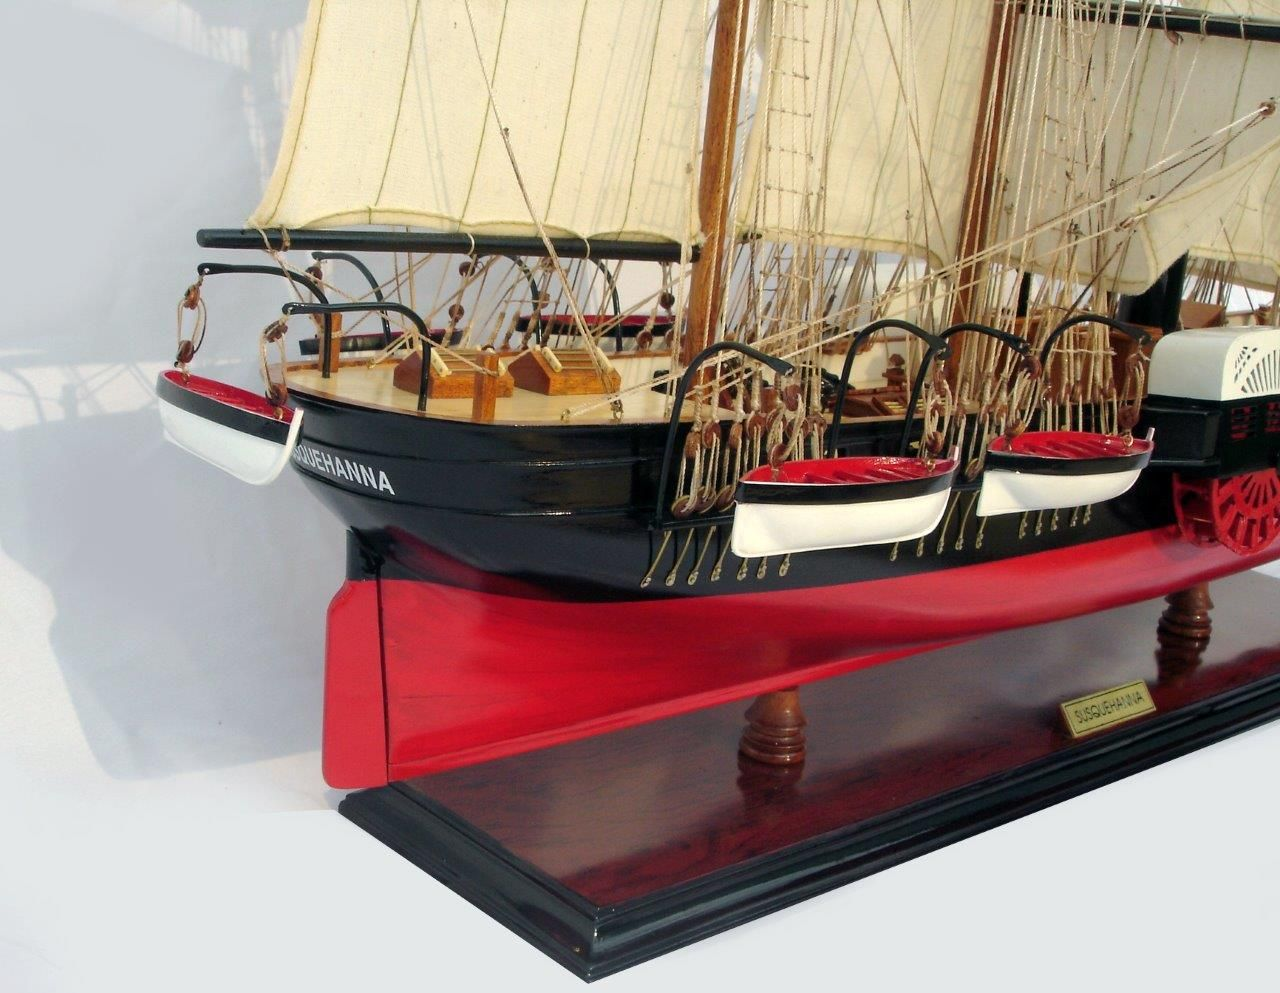 2098-12474-USS-Susquehanna-Model-Boat